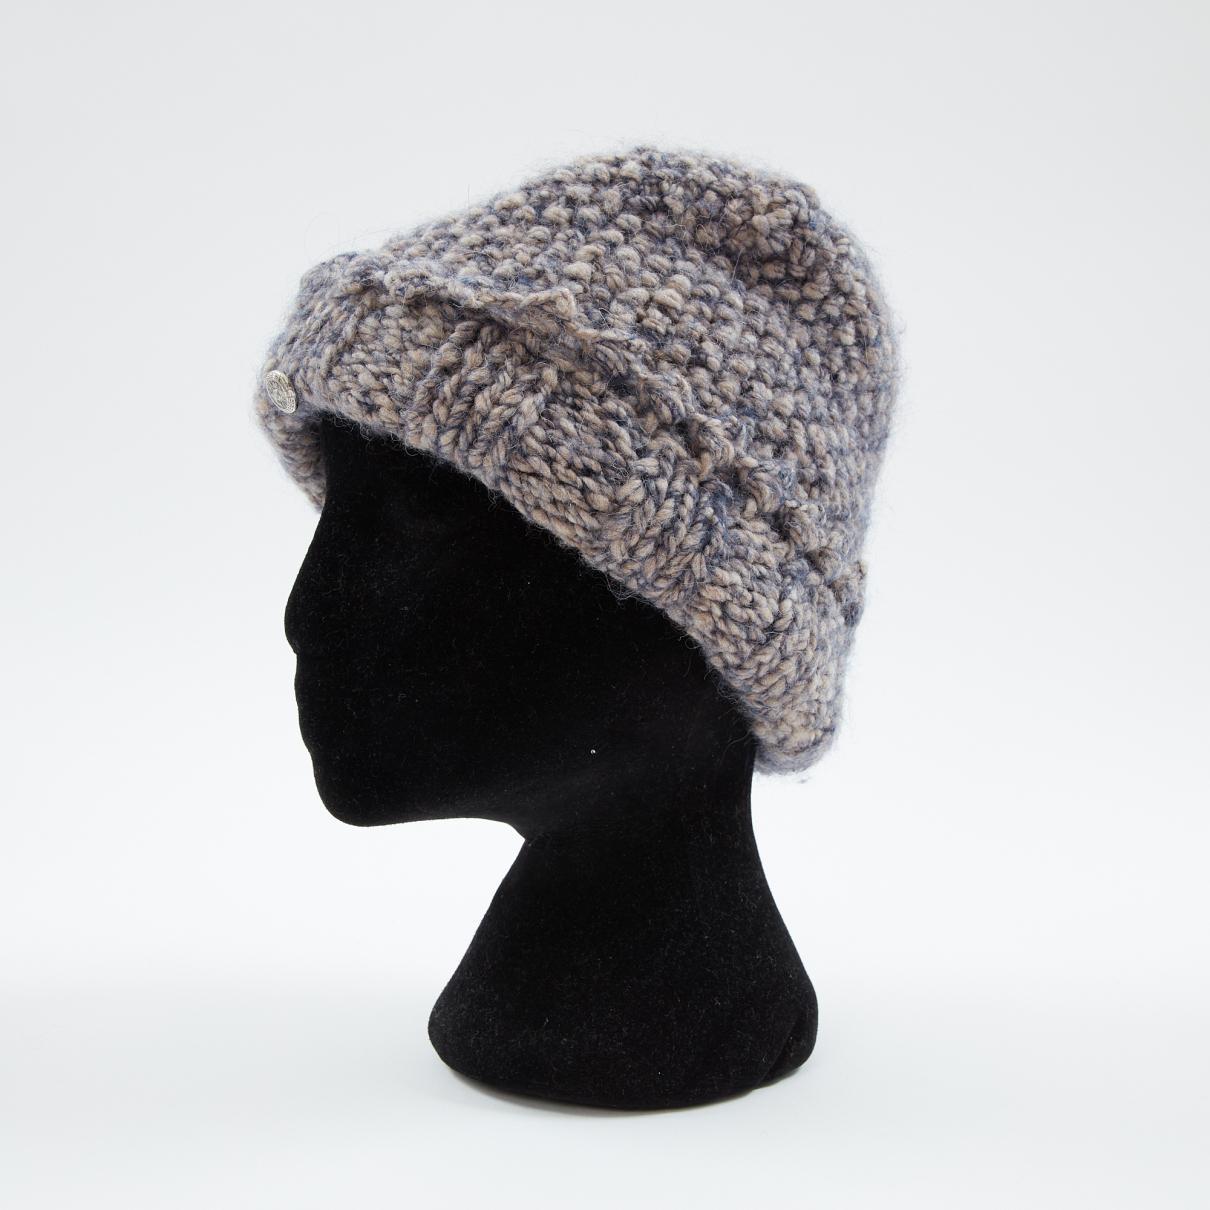 47b2681fc92 Lyst - Chanel Grey Wool Hats in Gray